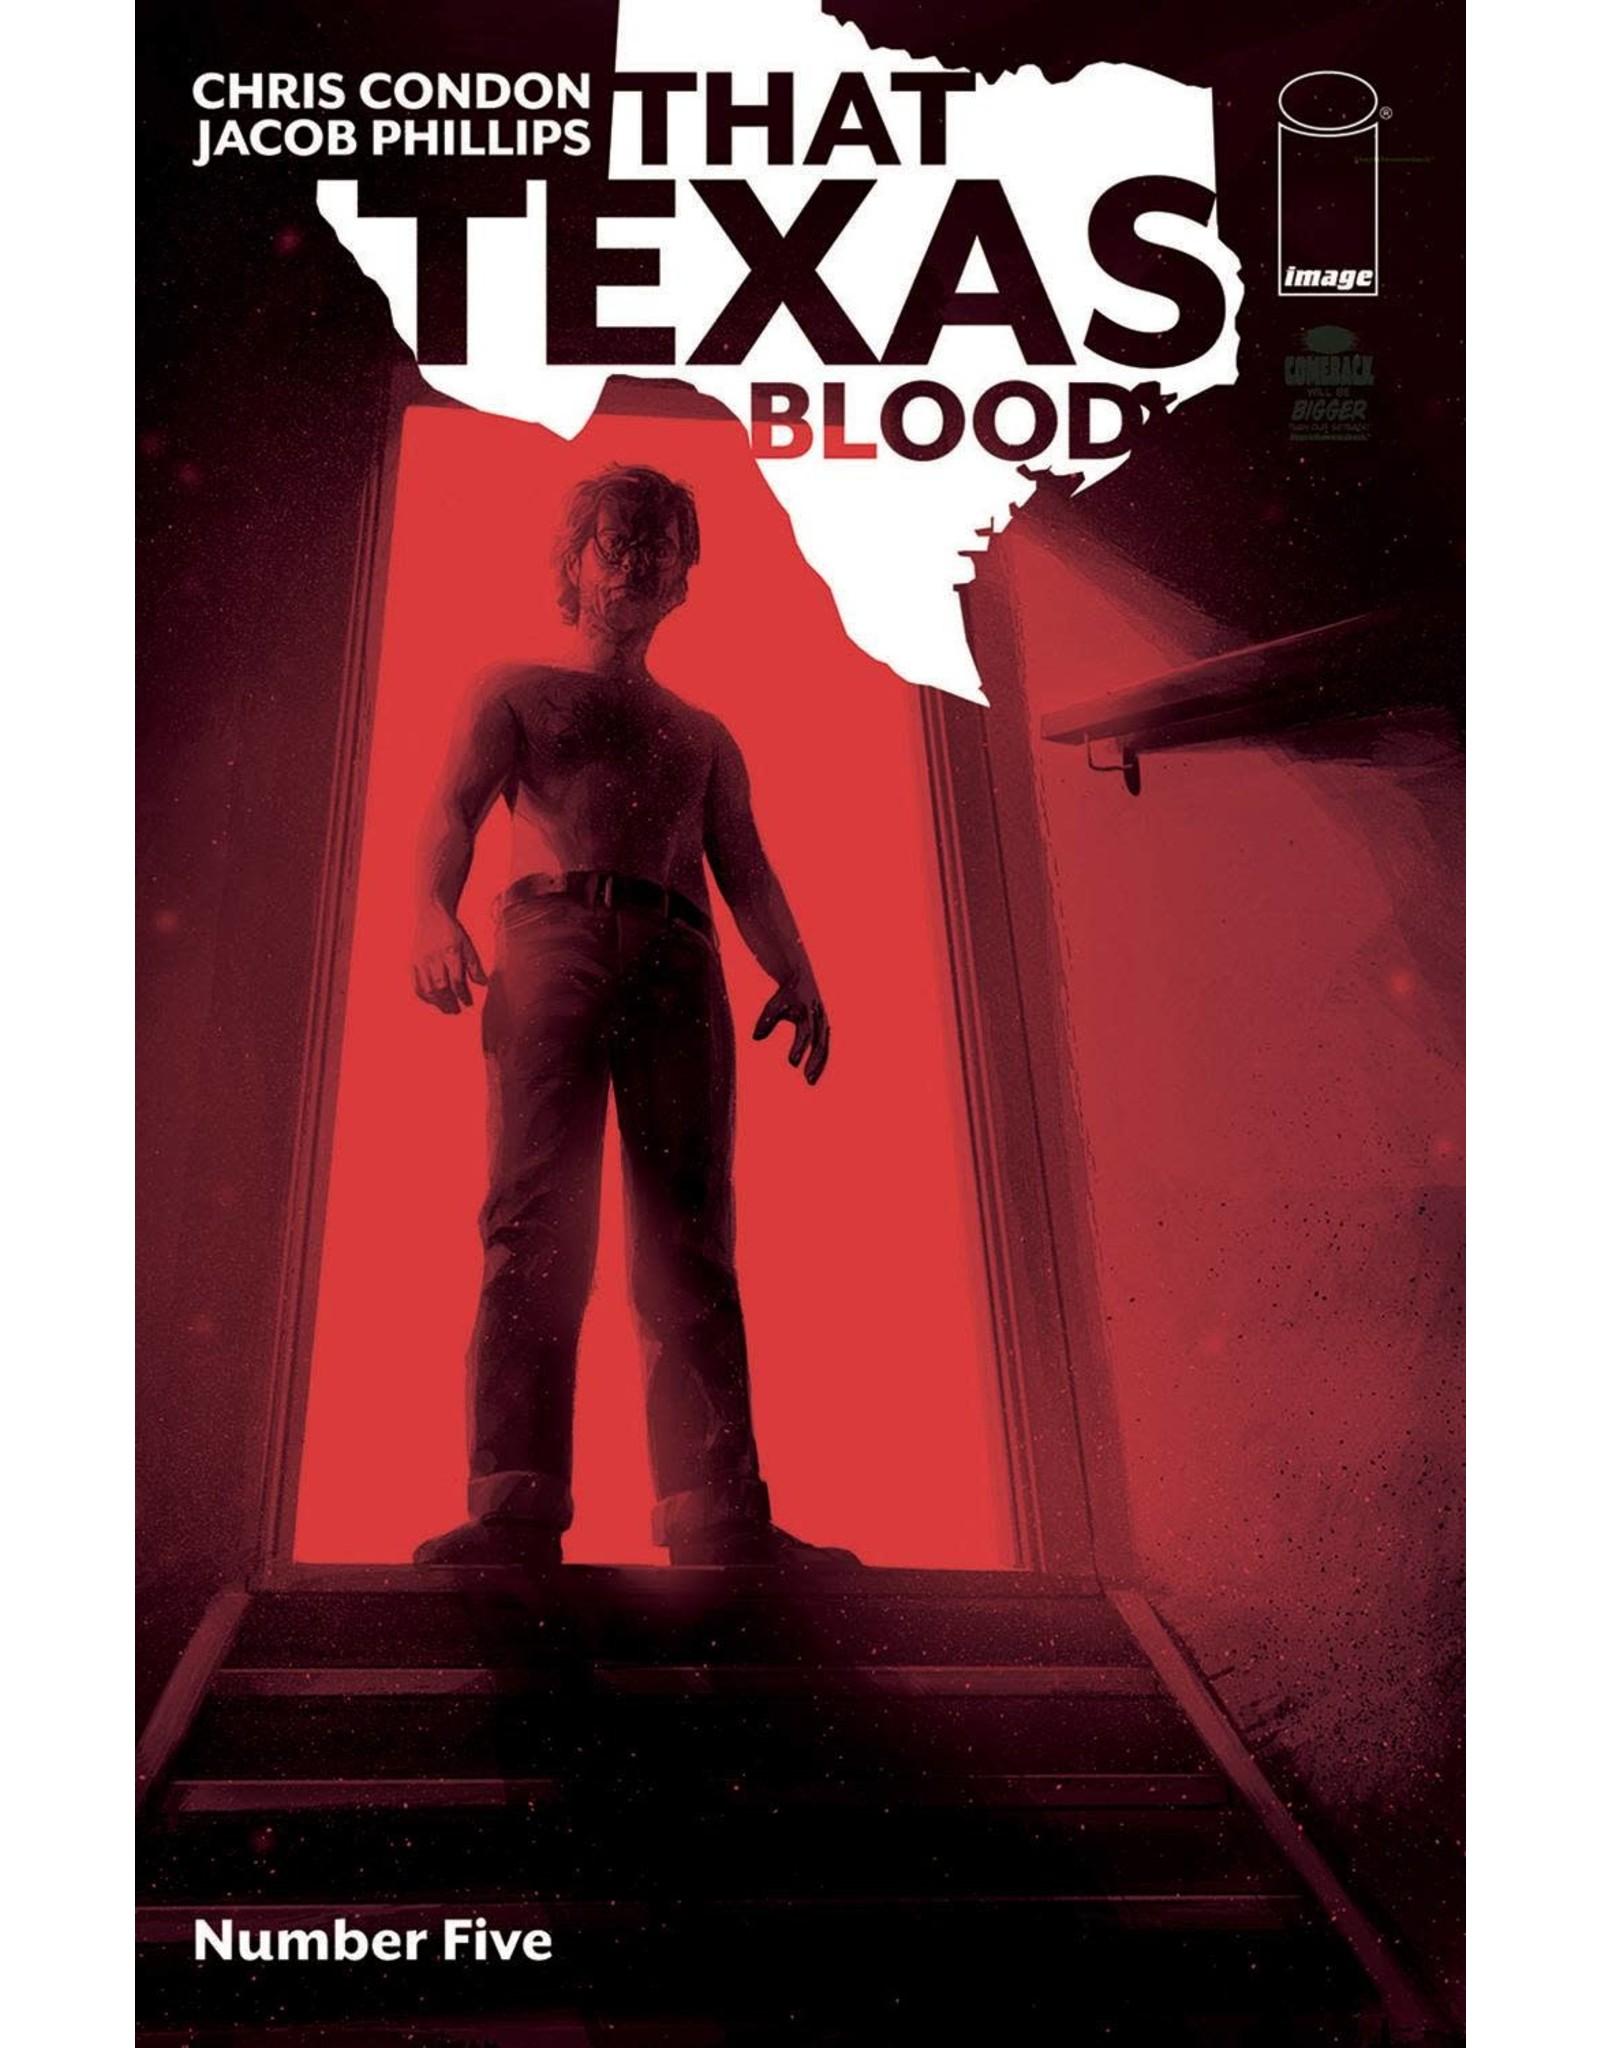 Image Comics THAT TEXAS BLOOD #5 (MR)